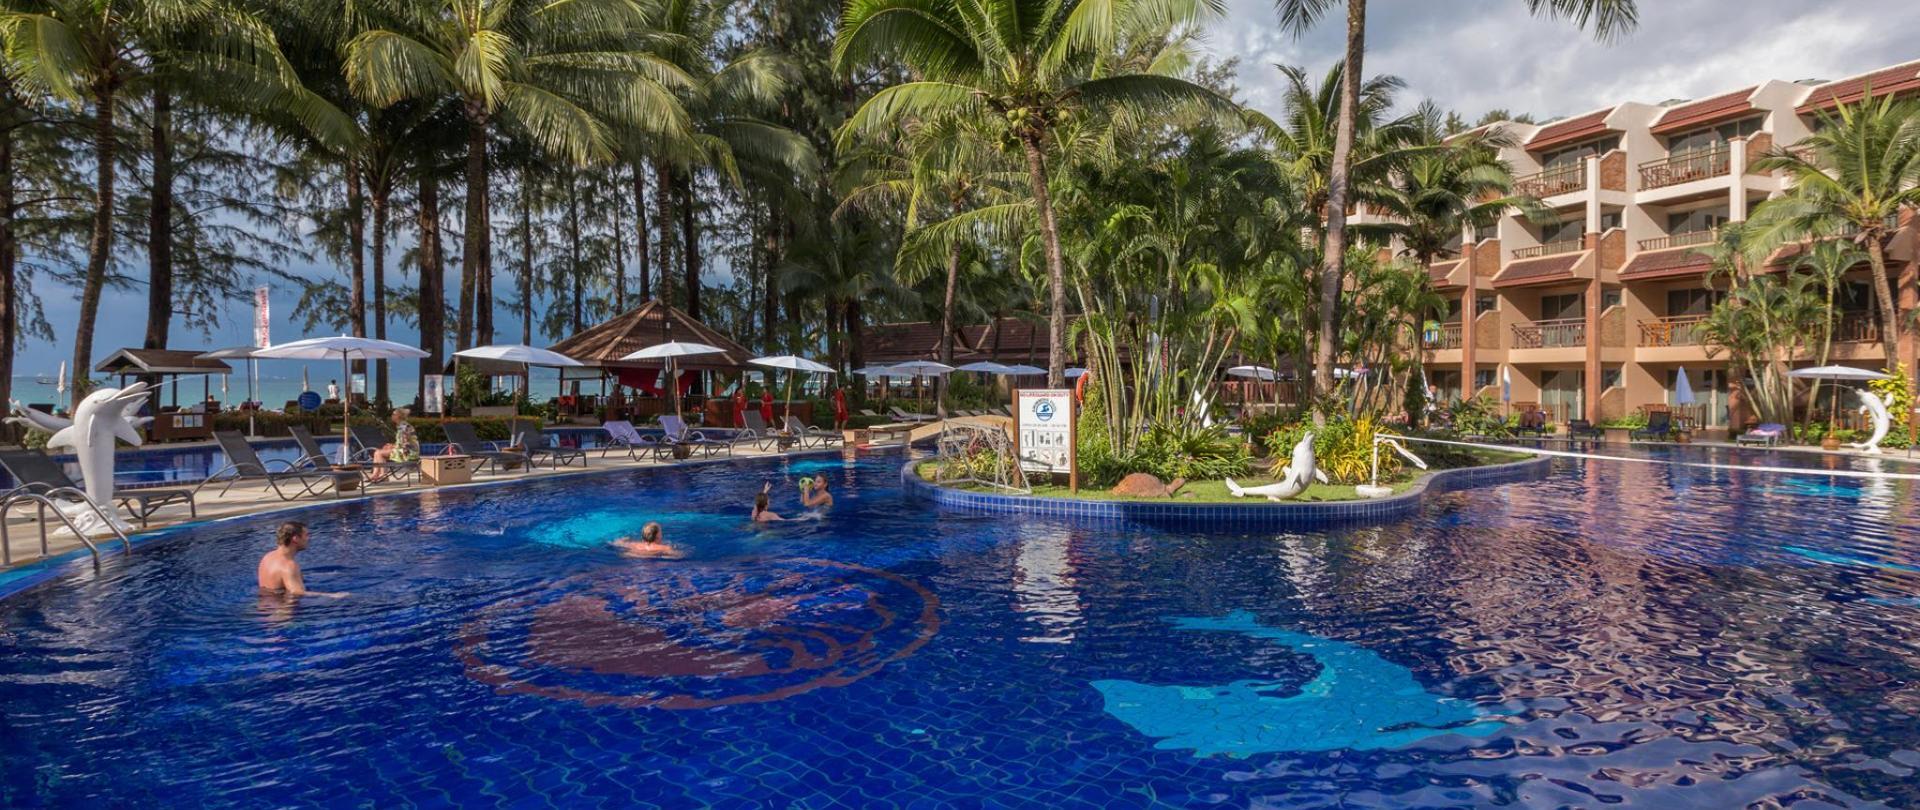 Best Western Premier Bangtao Beach Resort & Spa, Phuket